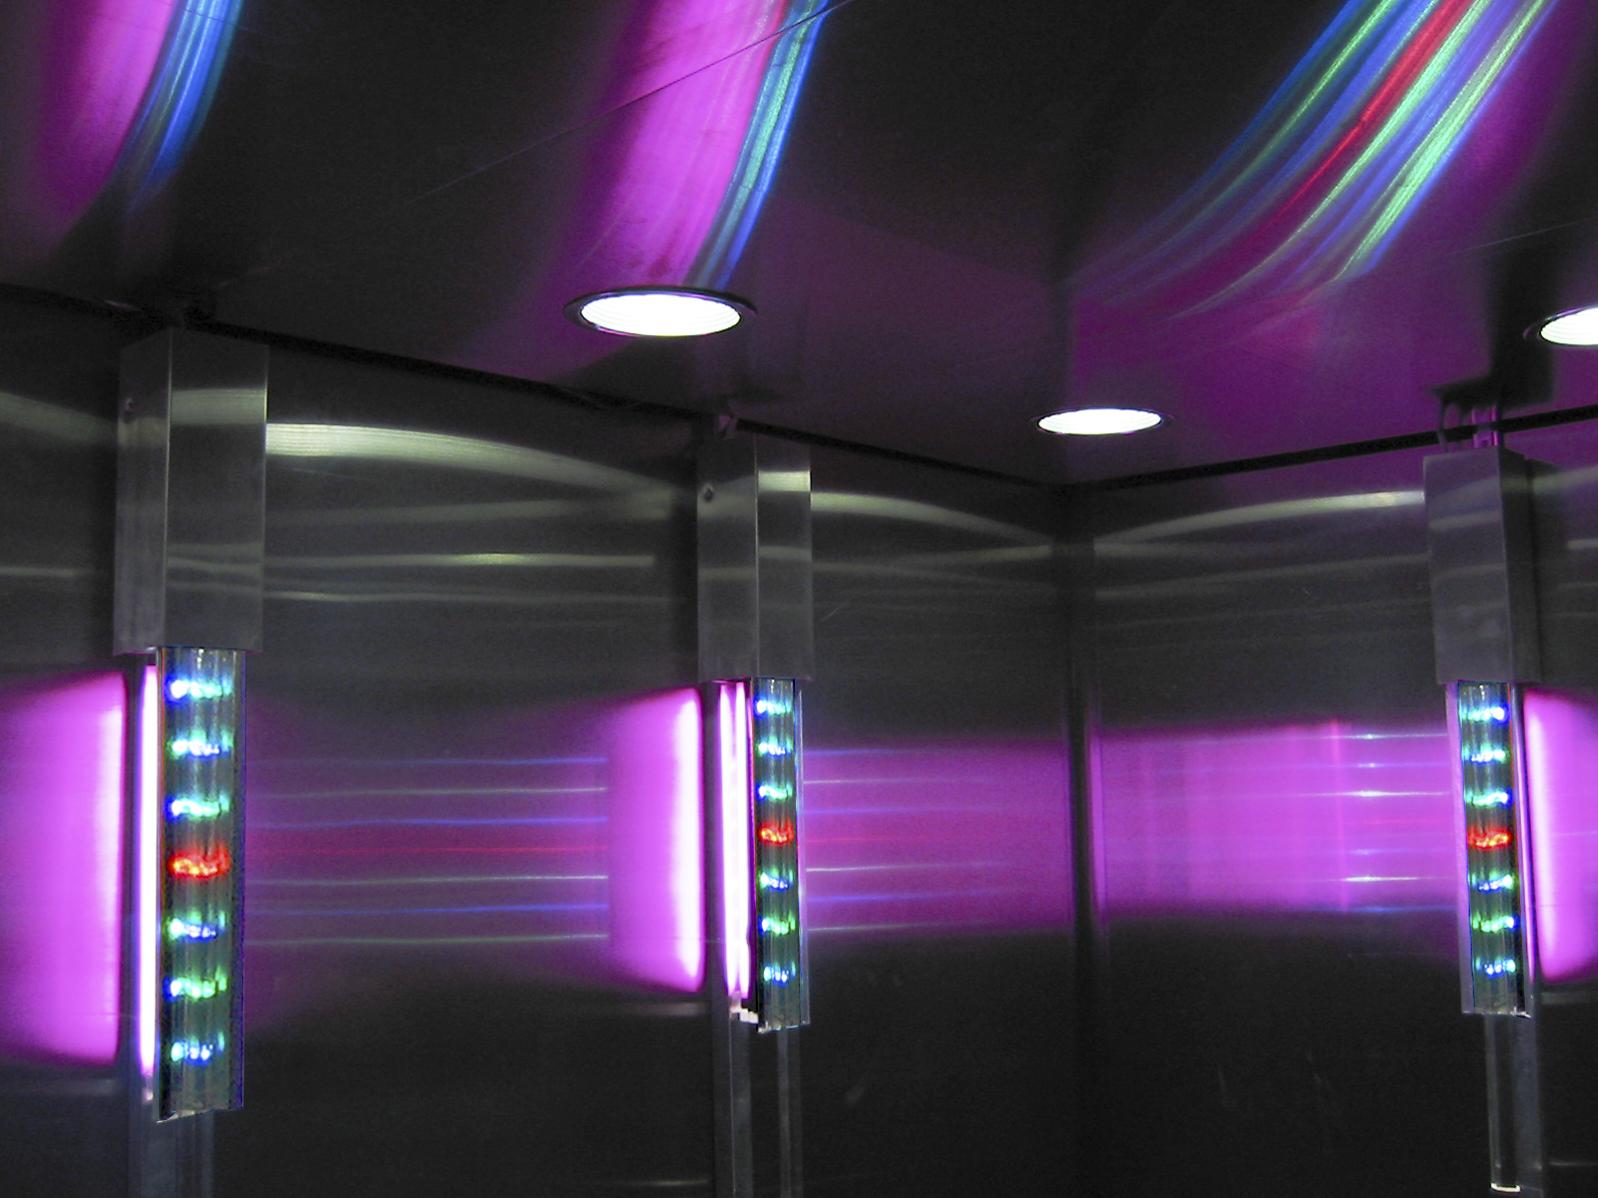 Salmanson_LuminousLayers_Elevator_Dumbo_2004_Puple.jpg